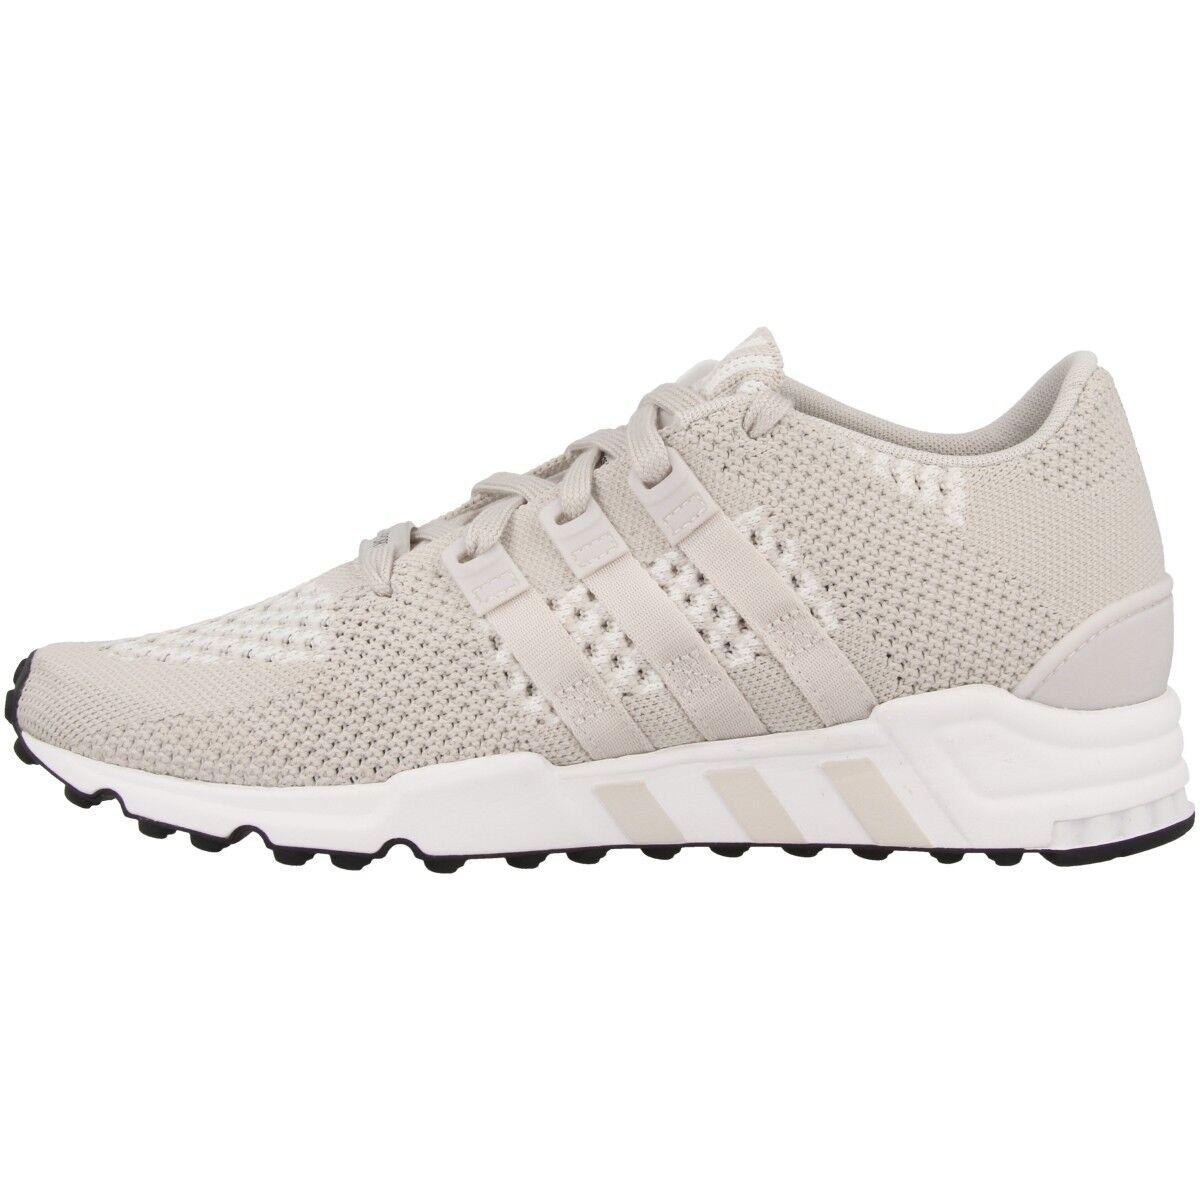 Damen Neu Skechers Speicher Schuhe Grau Silber Passform Form